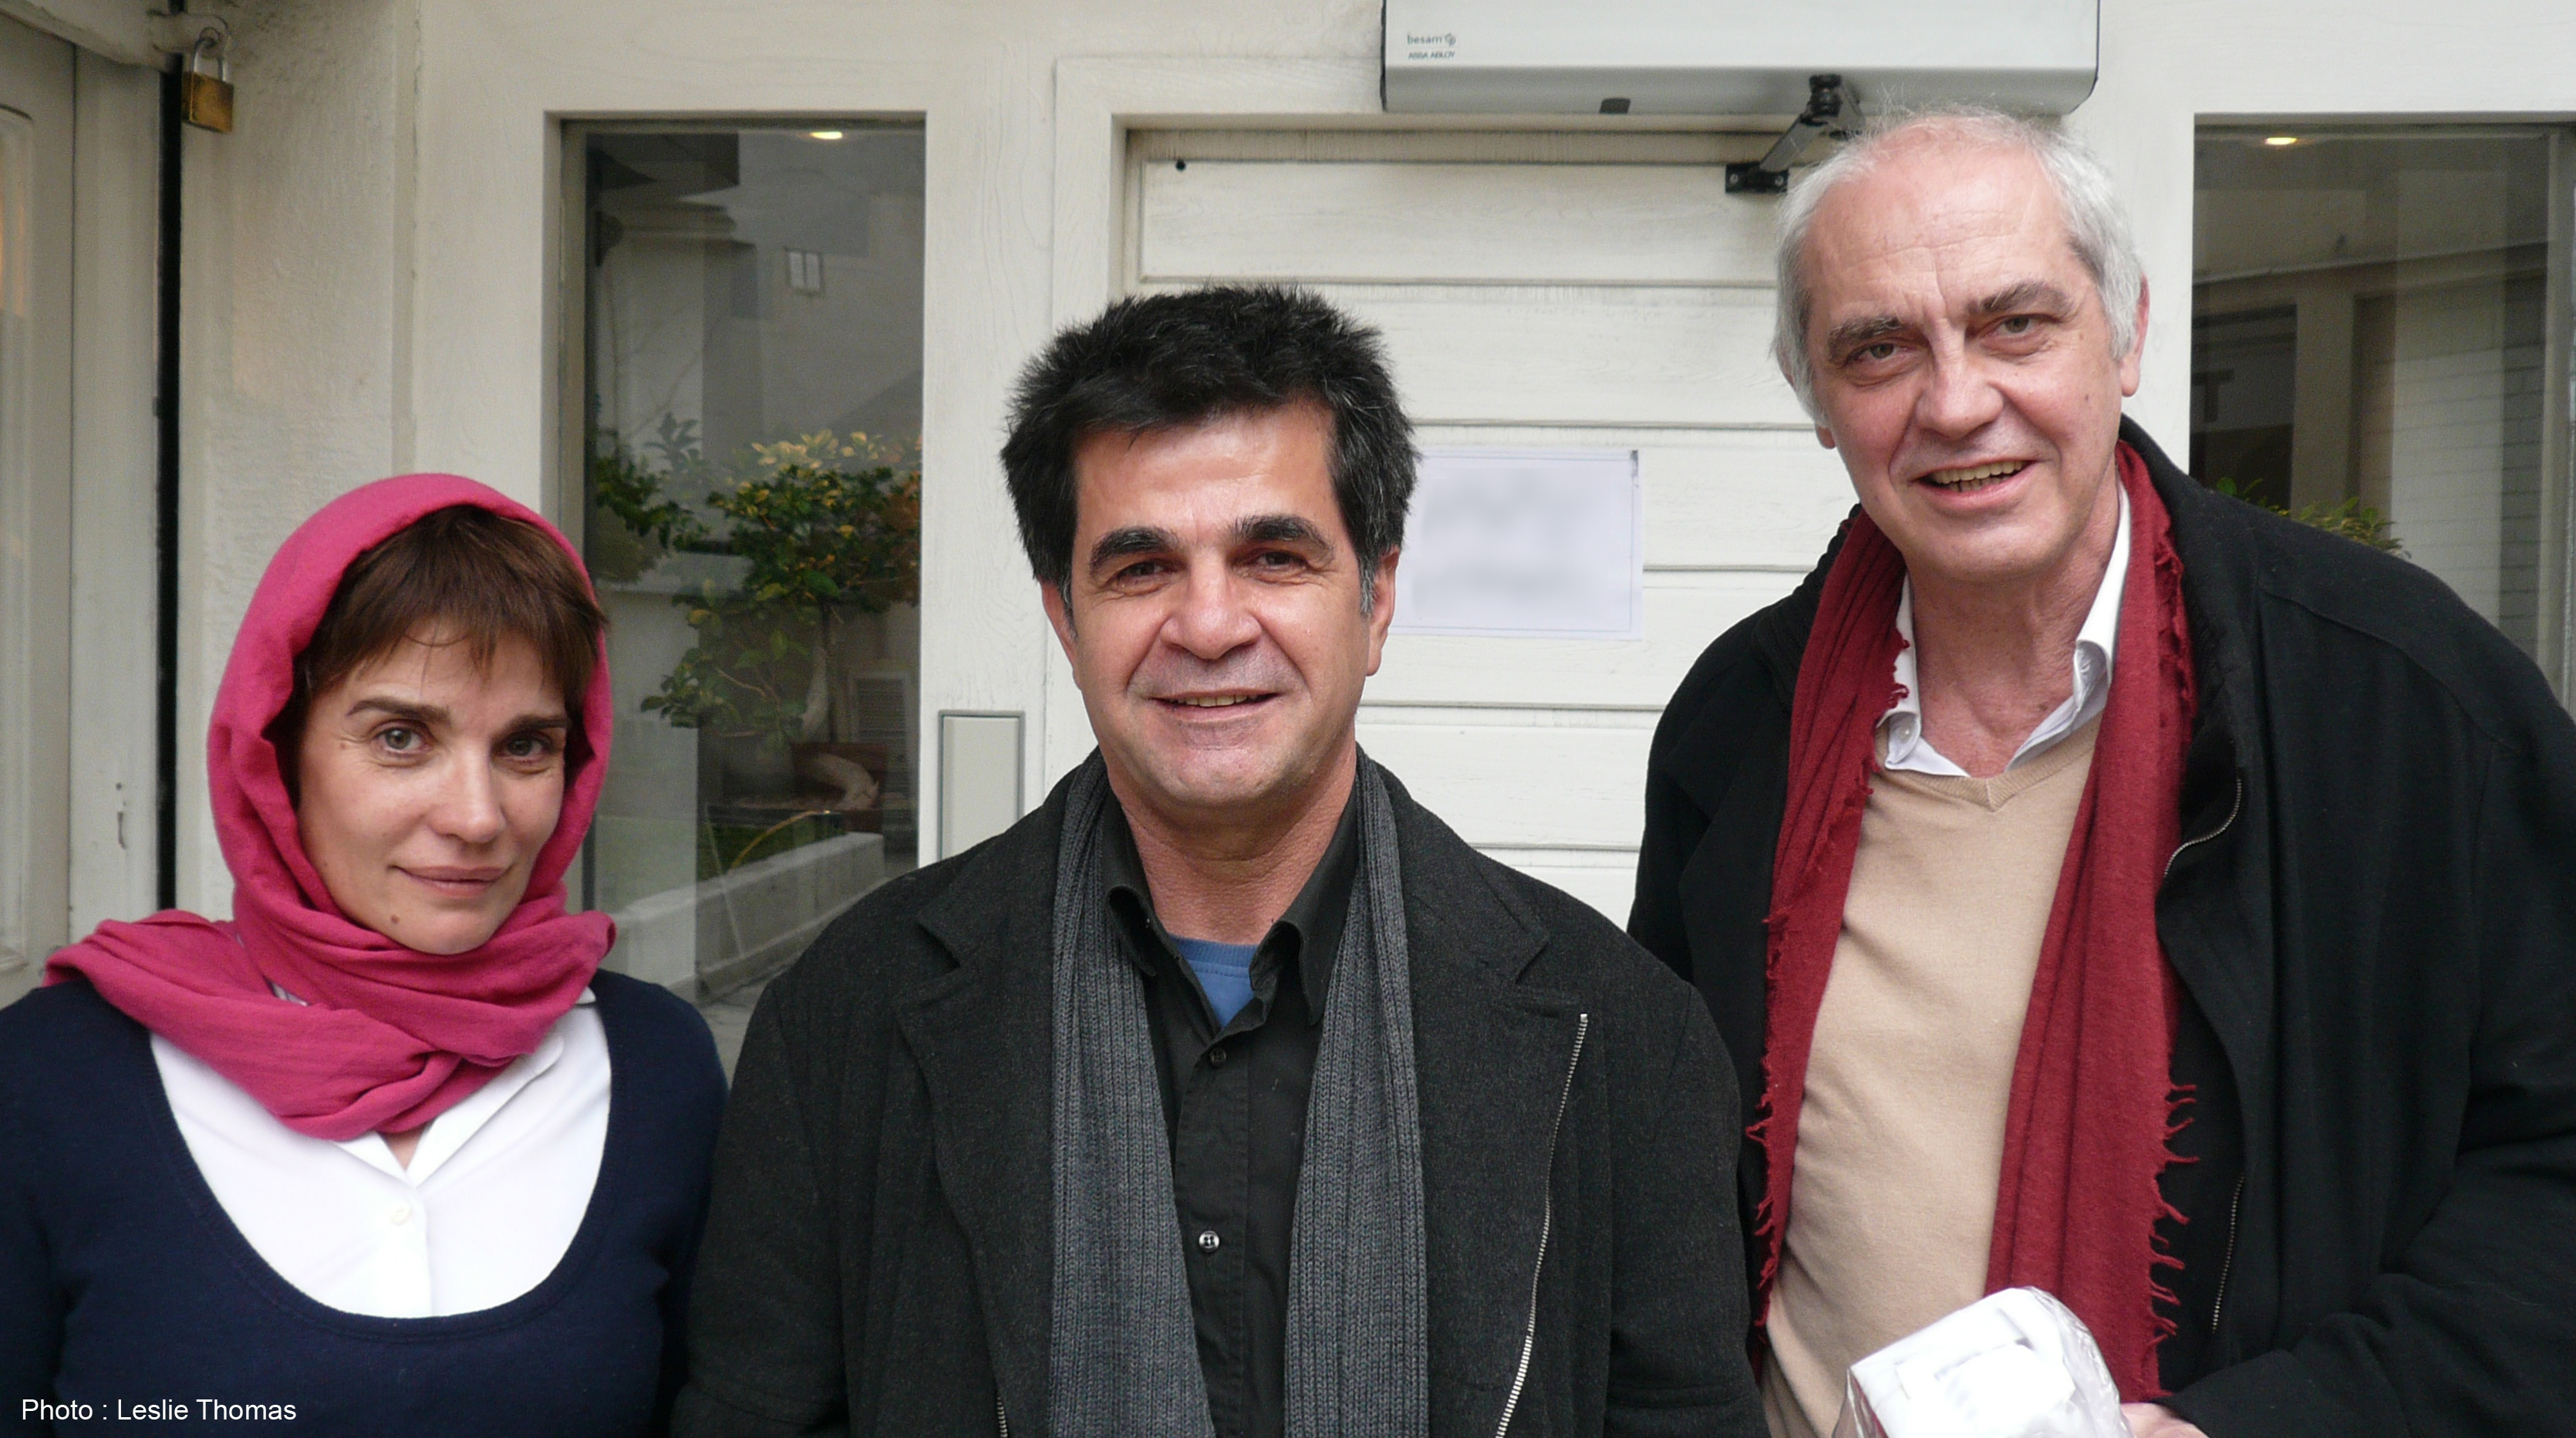 Christine Citti, Jafar Panahi et Jean-Louis Martinelli. © Leslie Thomas